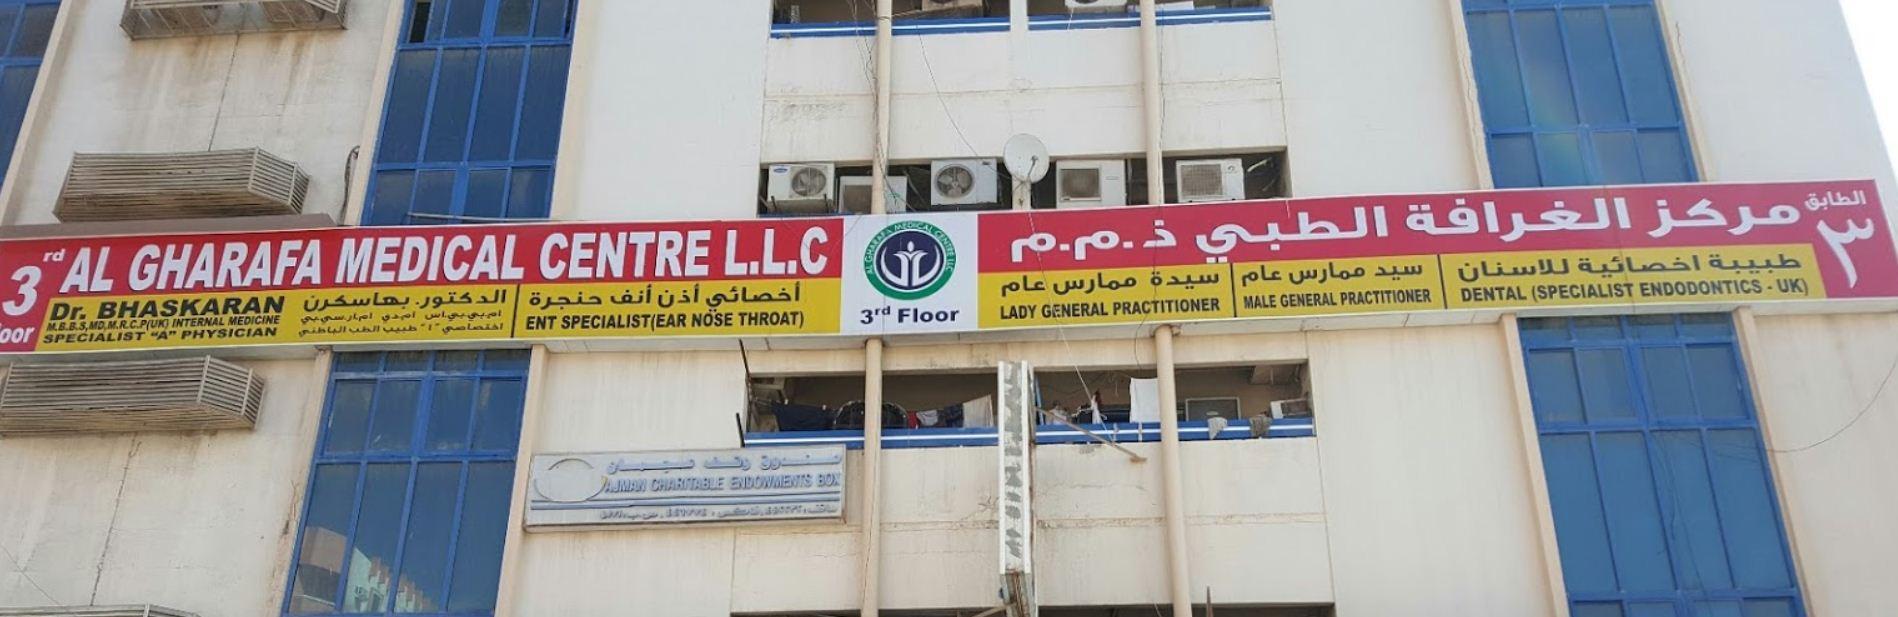 Al Gharafa Medical Centre in Al bustan